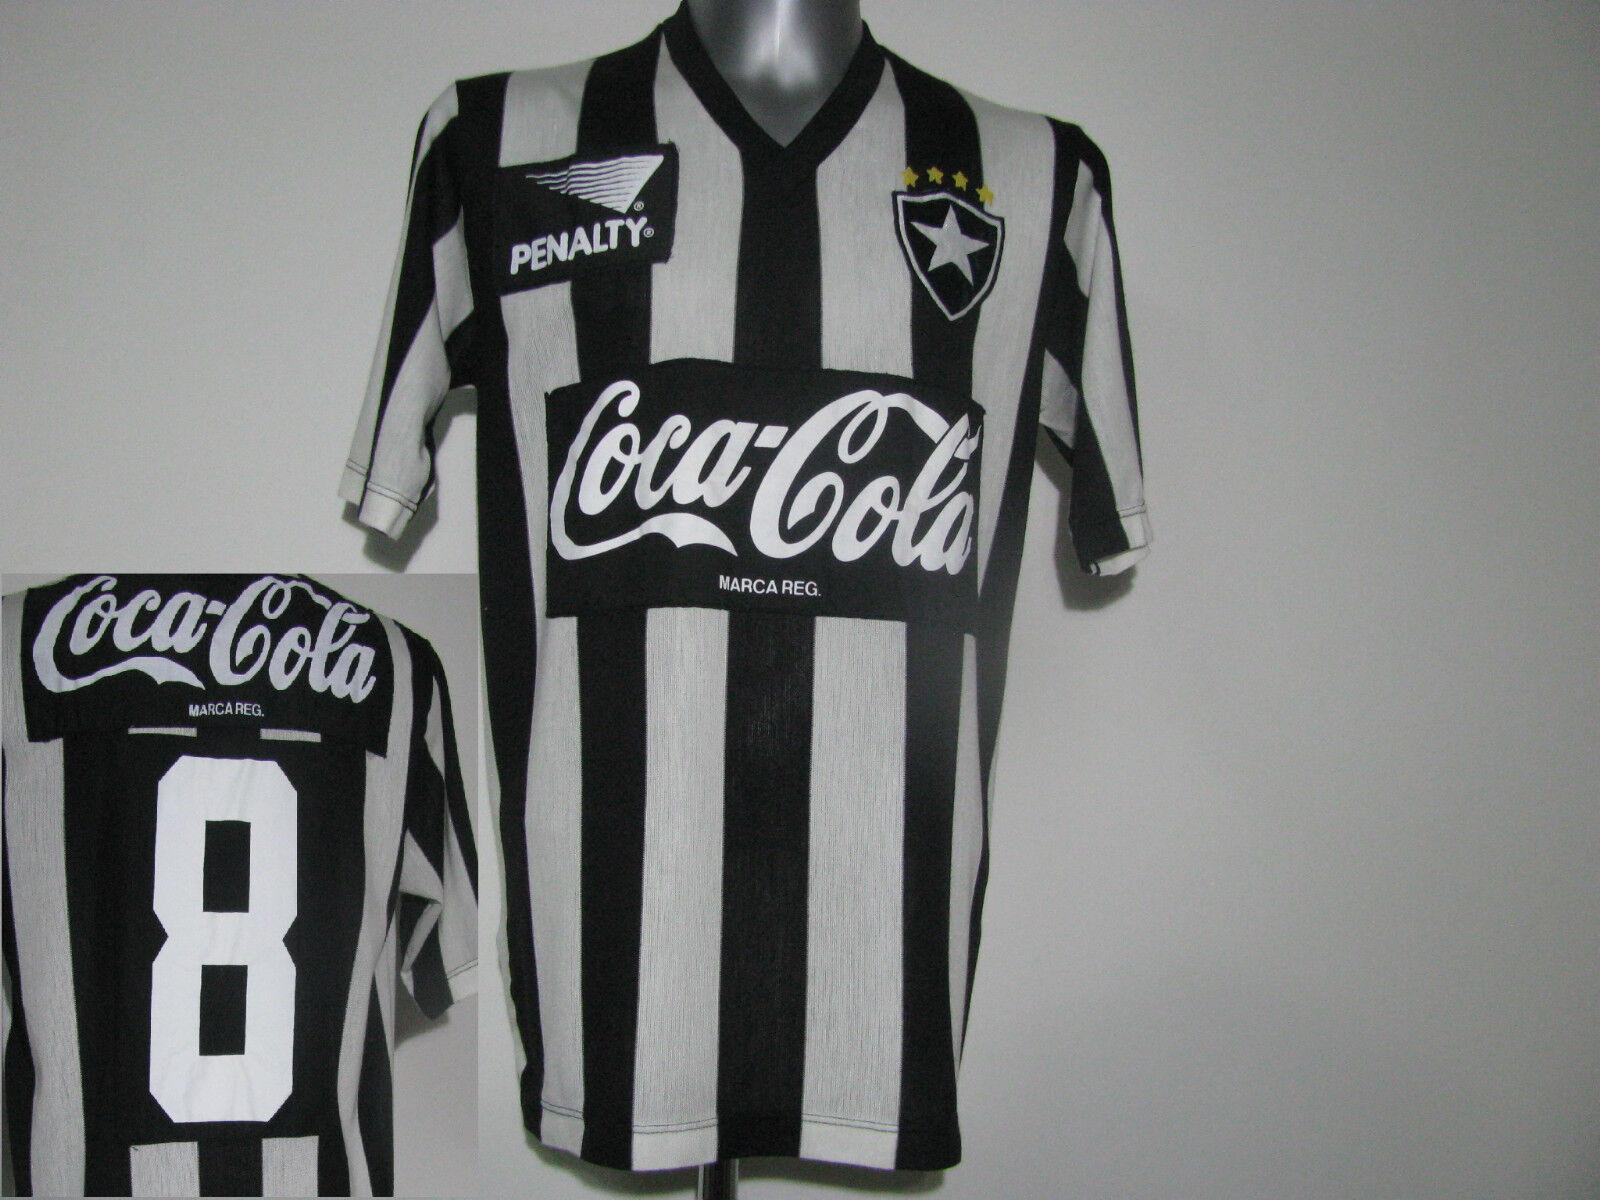 BOTAFOGO Bota Fogo 1989/1990 shirt Penalty  8 LUISINHO Home shirt 1989/1990 trikot camiseta (XL) 7541f4